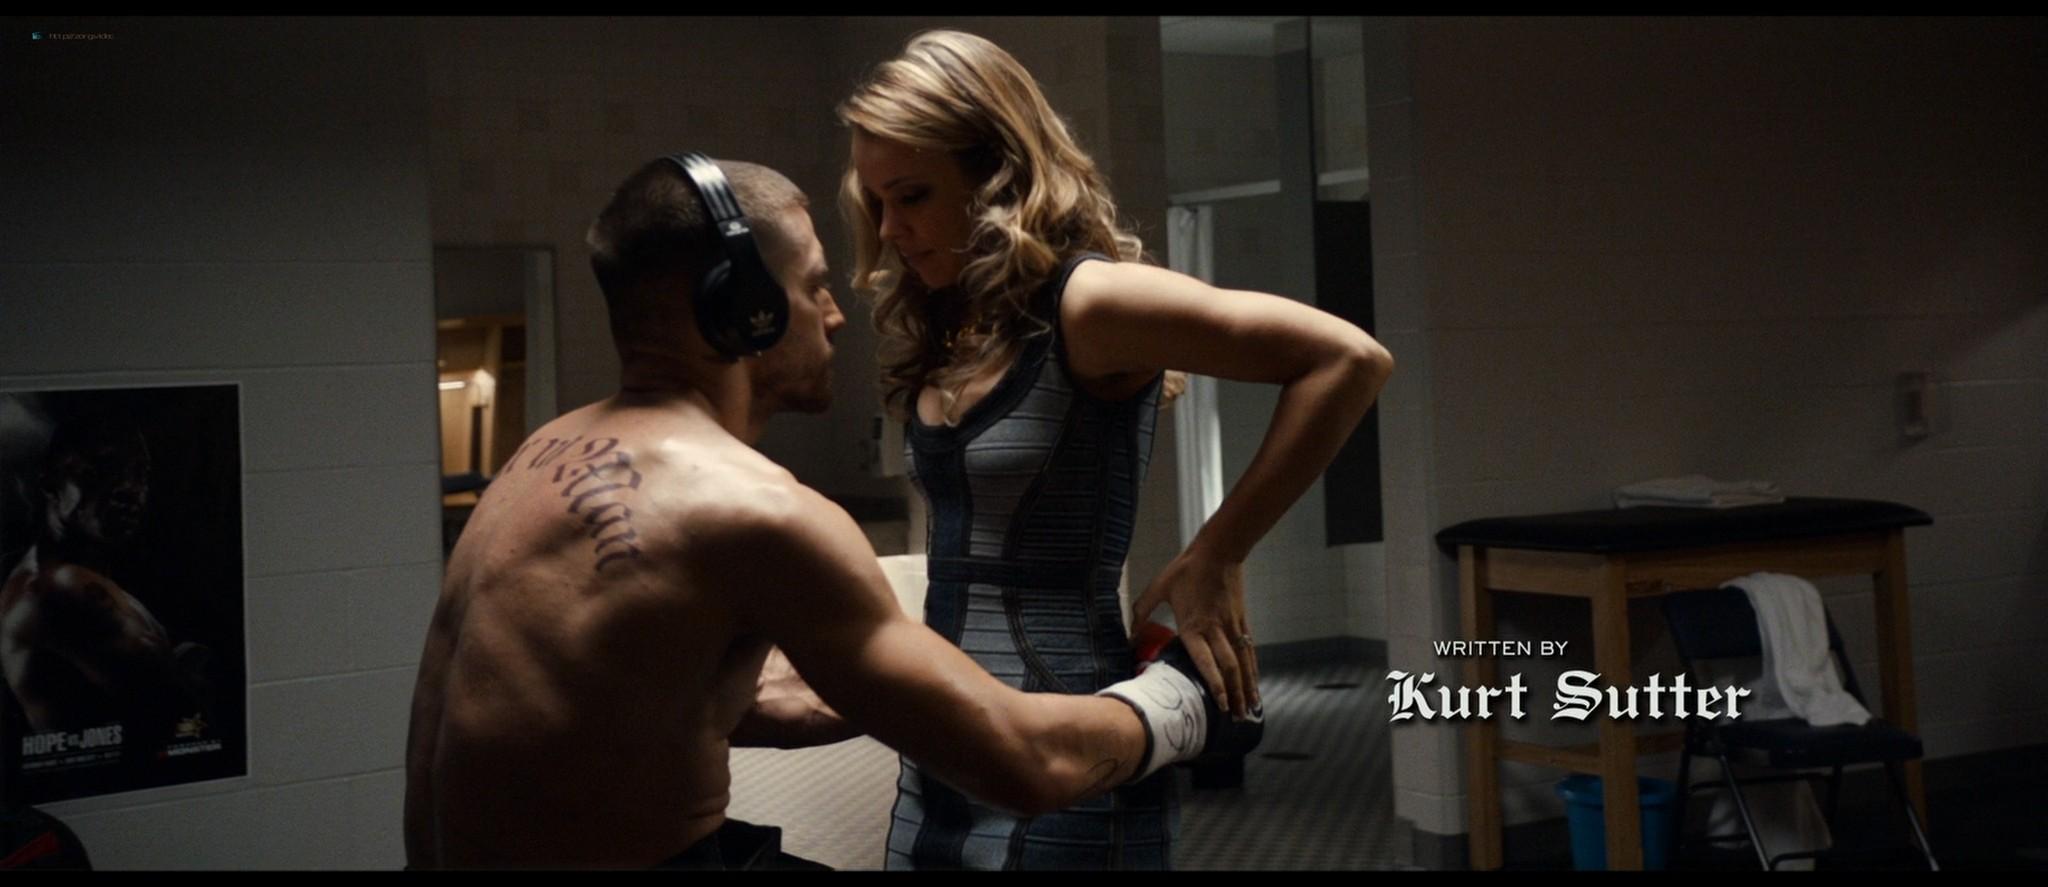 Rachel McAdams hot in panties and bra - Southpaw (2015) HD 1080p BluRay (13)